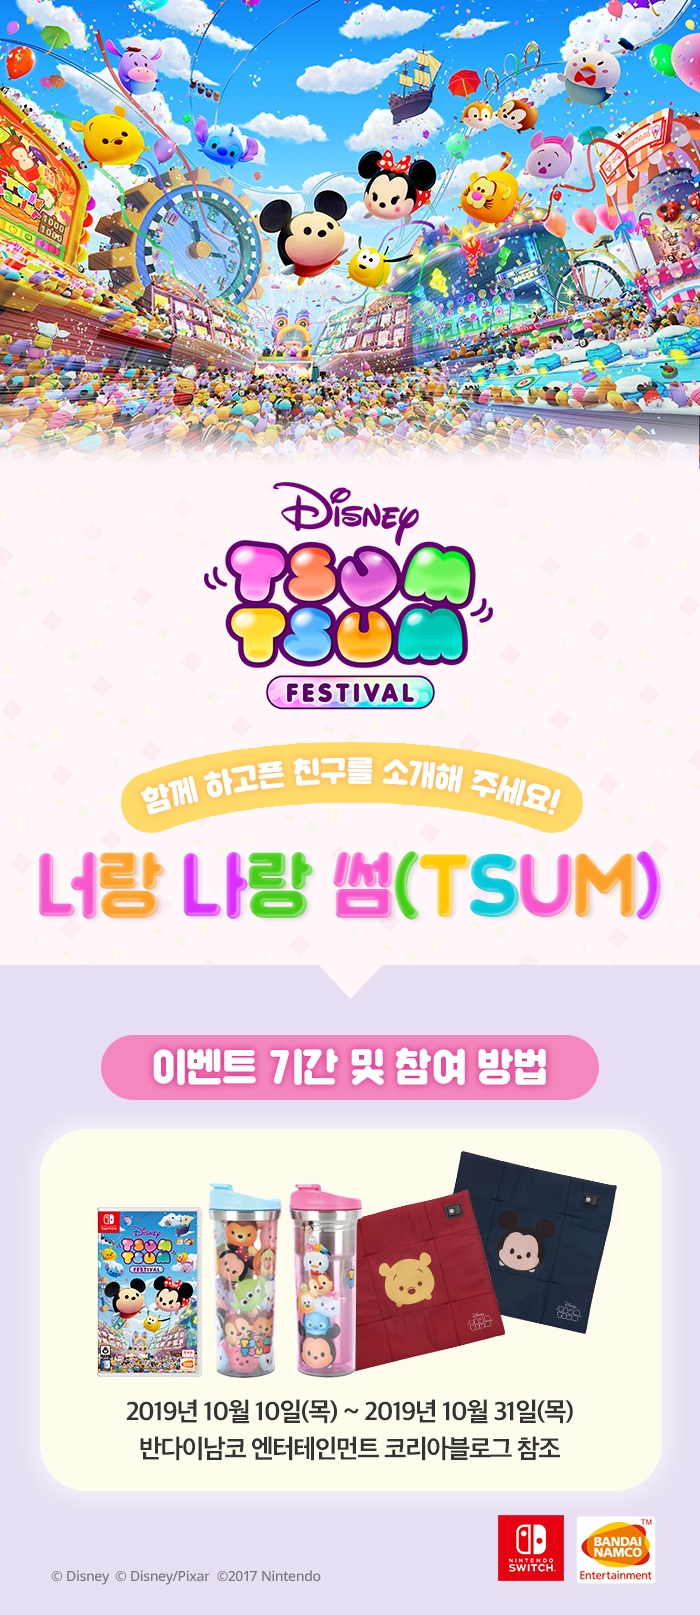 Tsum_Fes_Event_Image.jpg